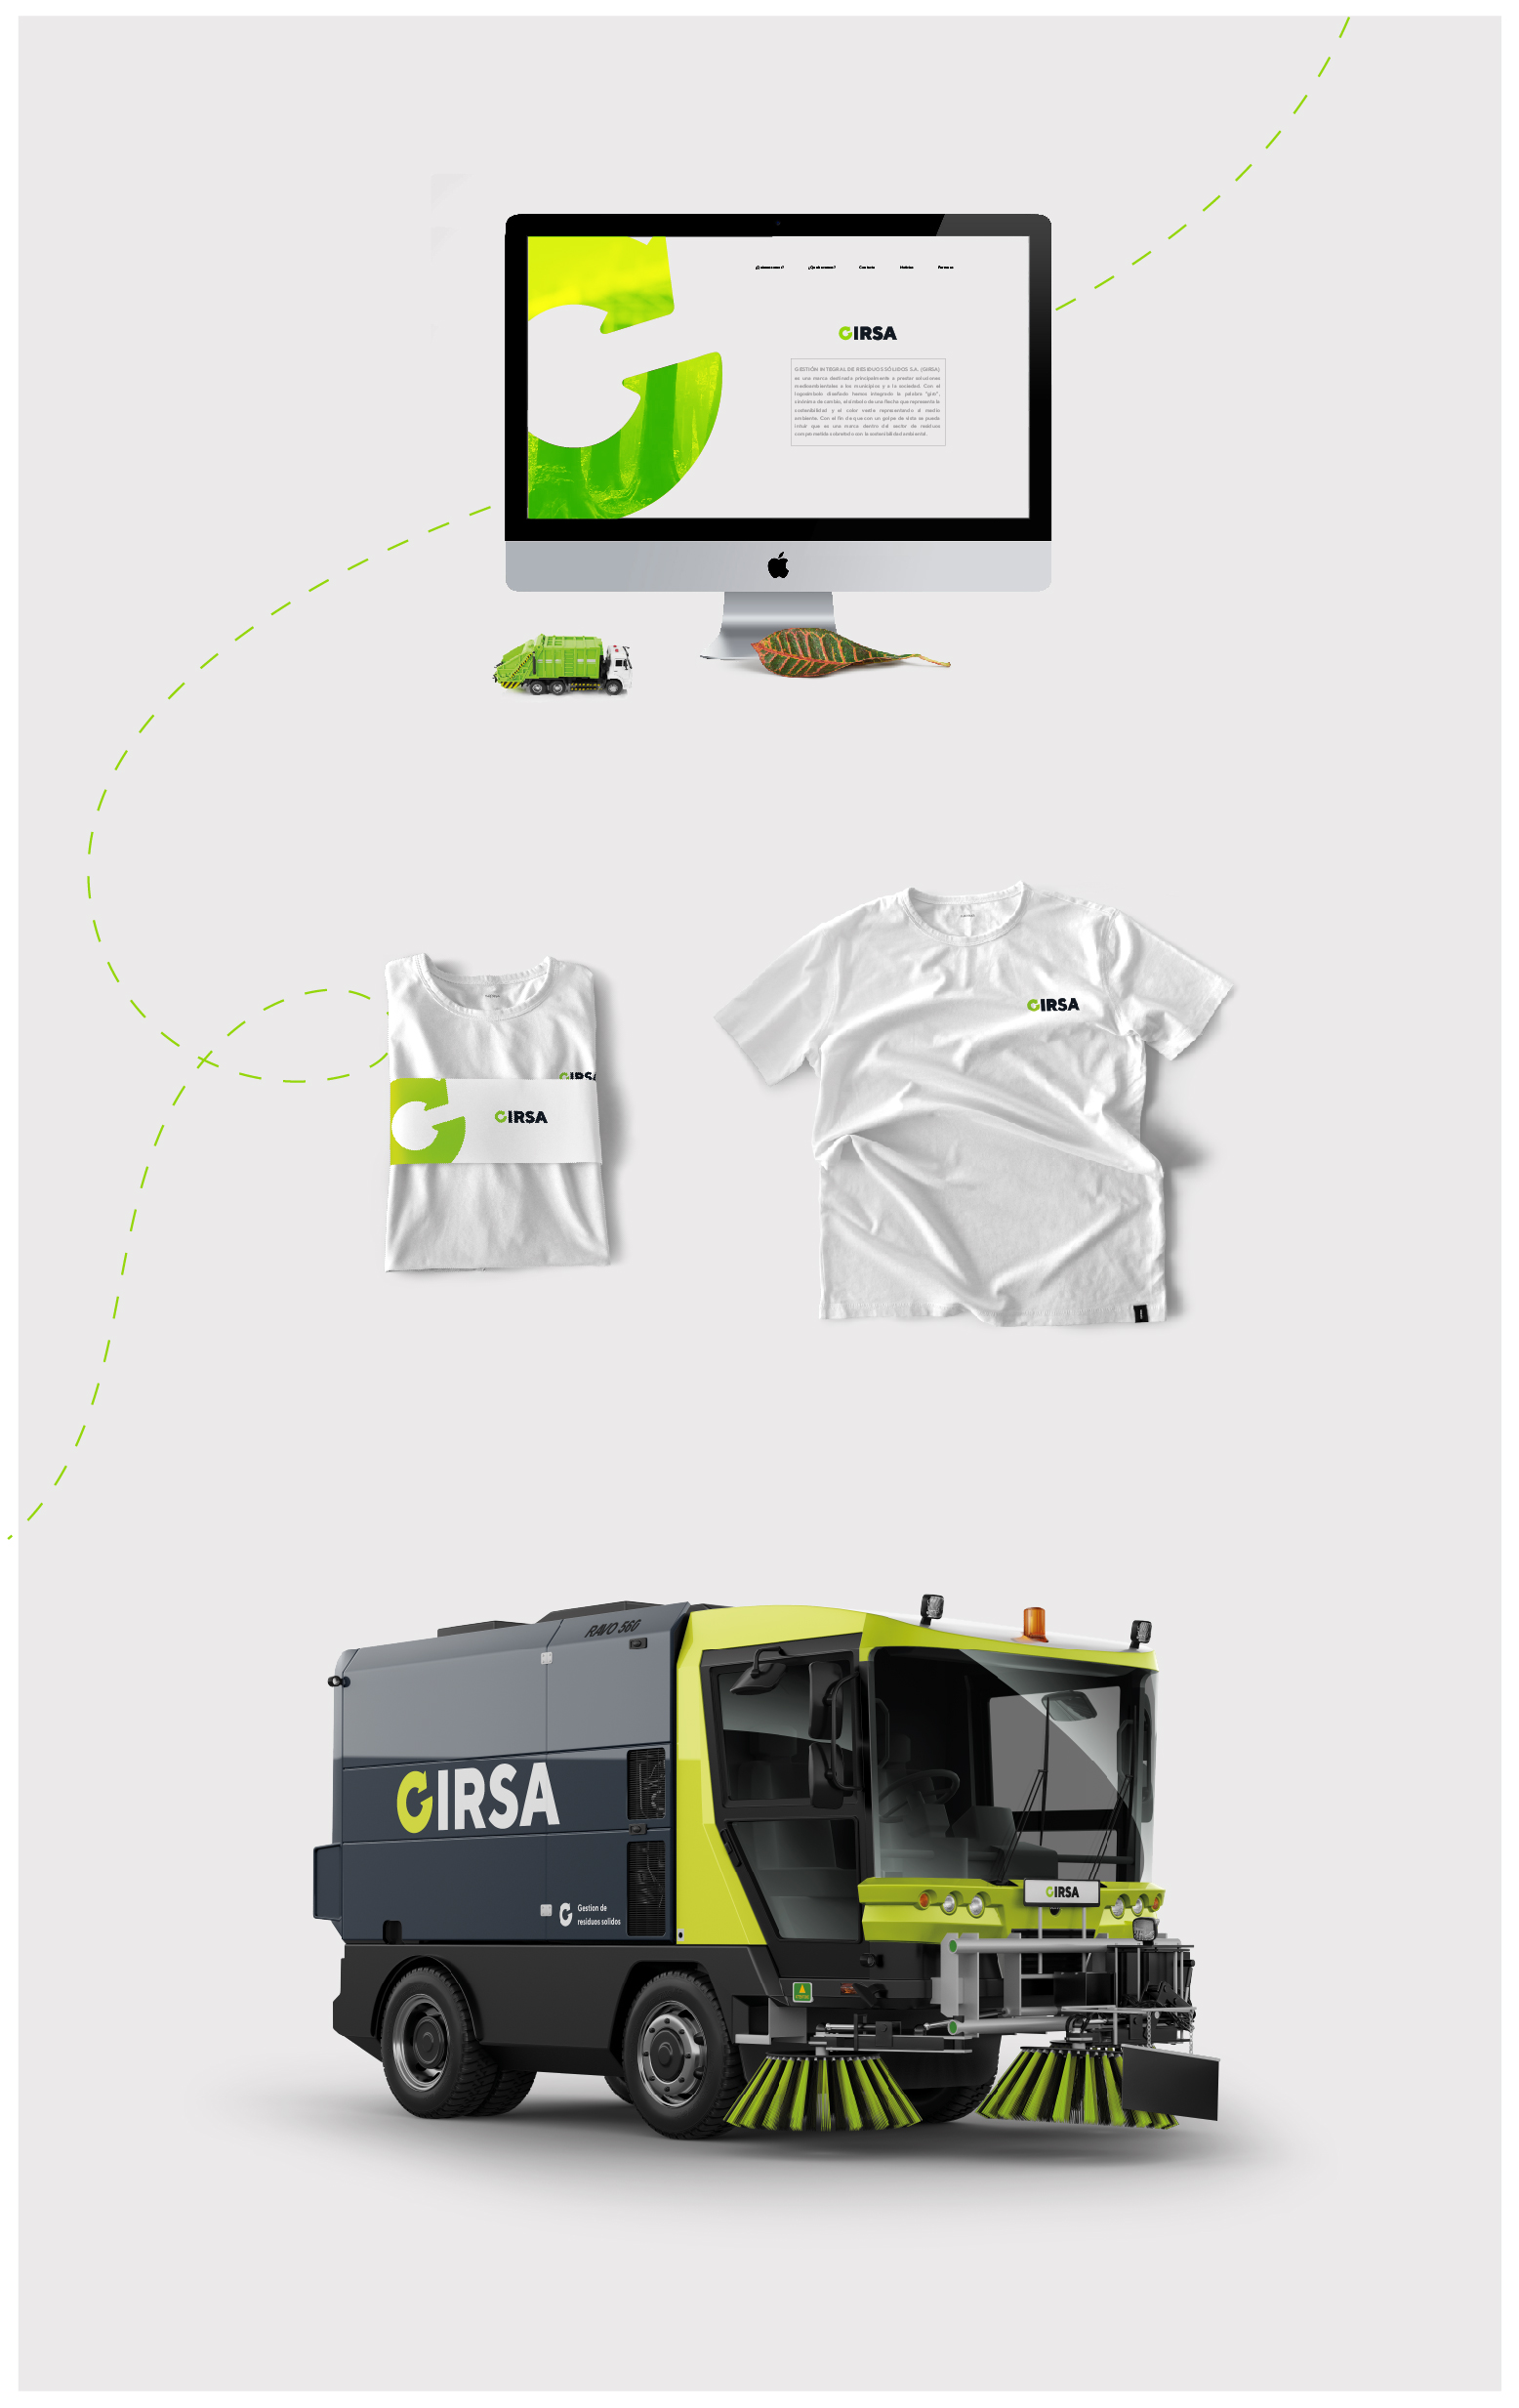 Girsa by Ángel Tomás Albaladejo - Creative Work - $i